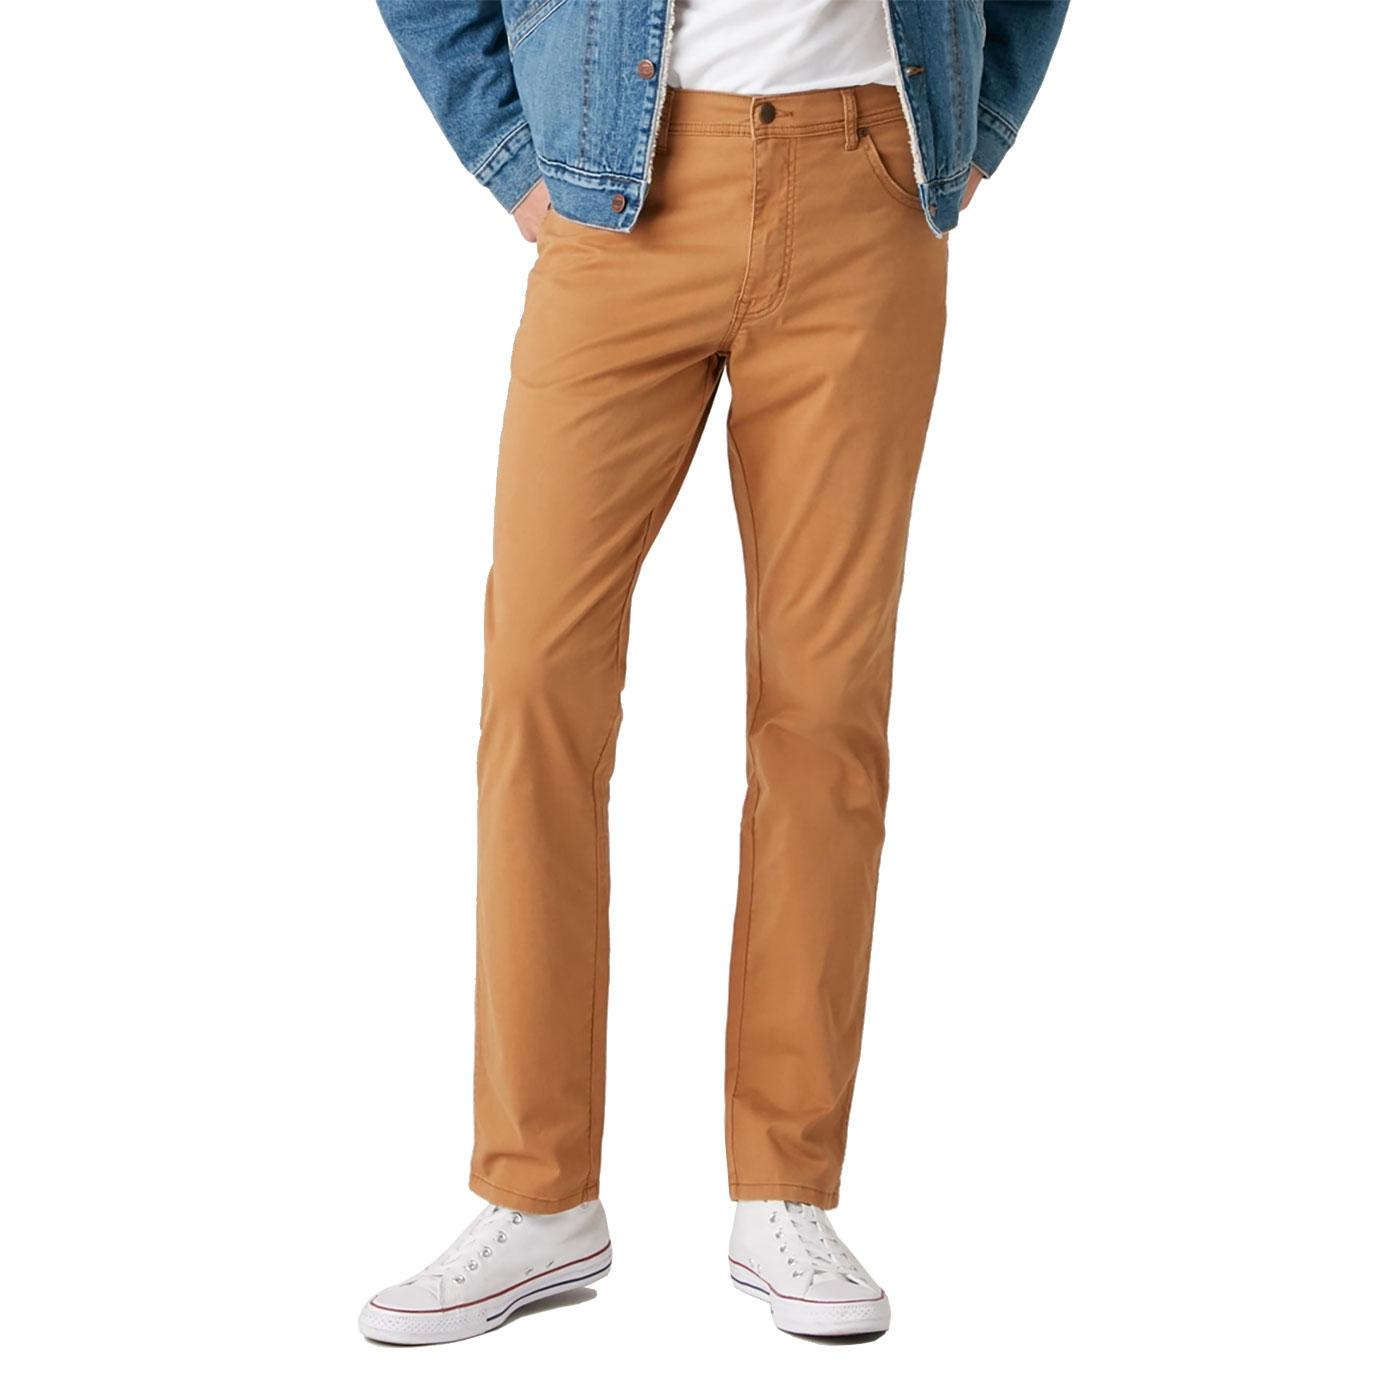 Texas WRANGLER Mens Retro Slim Trousers BISCUIT